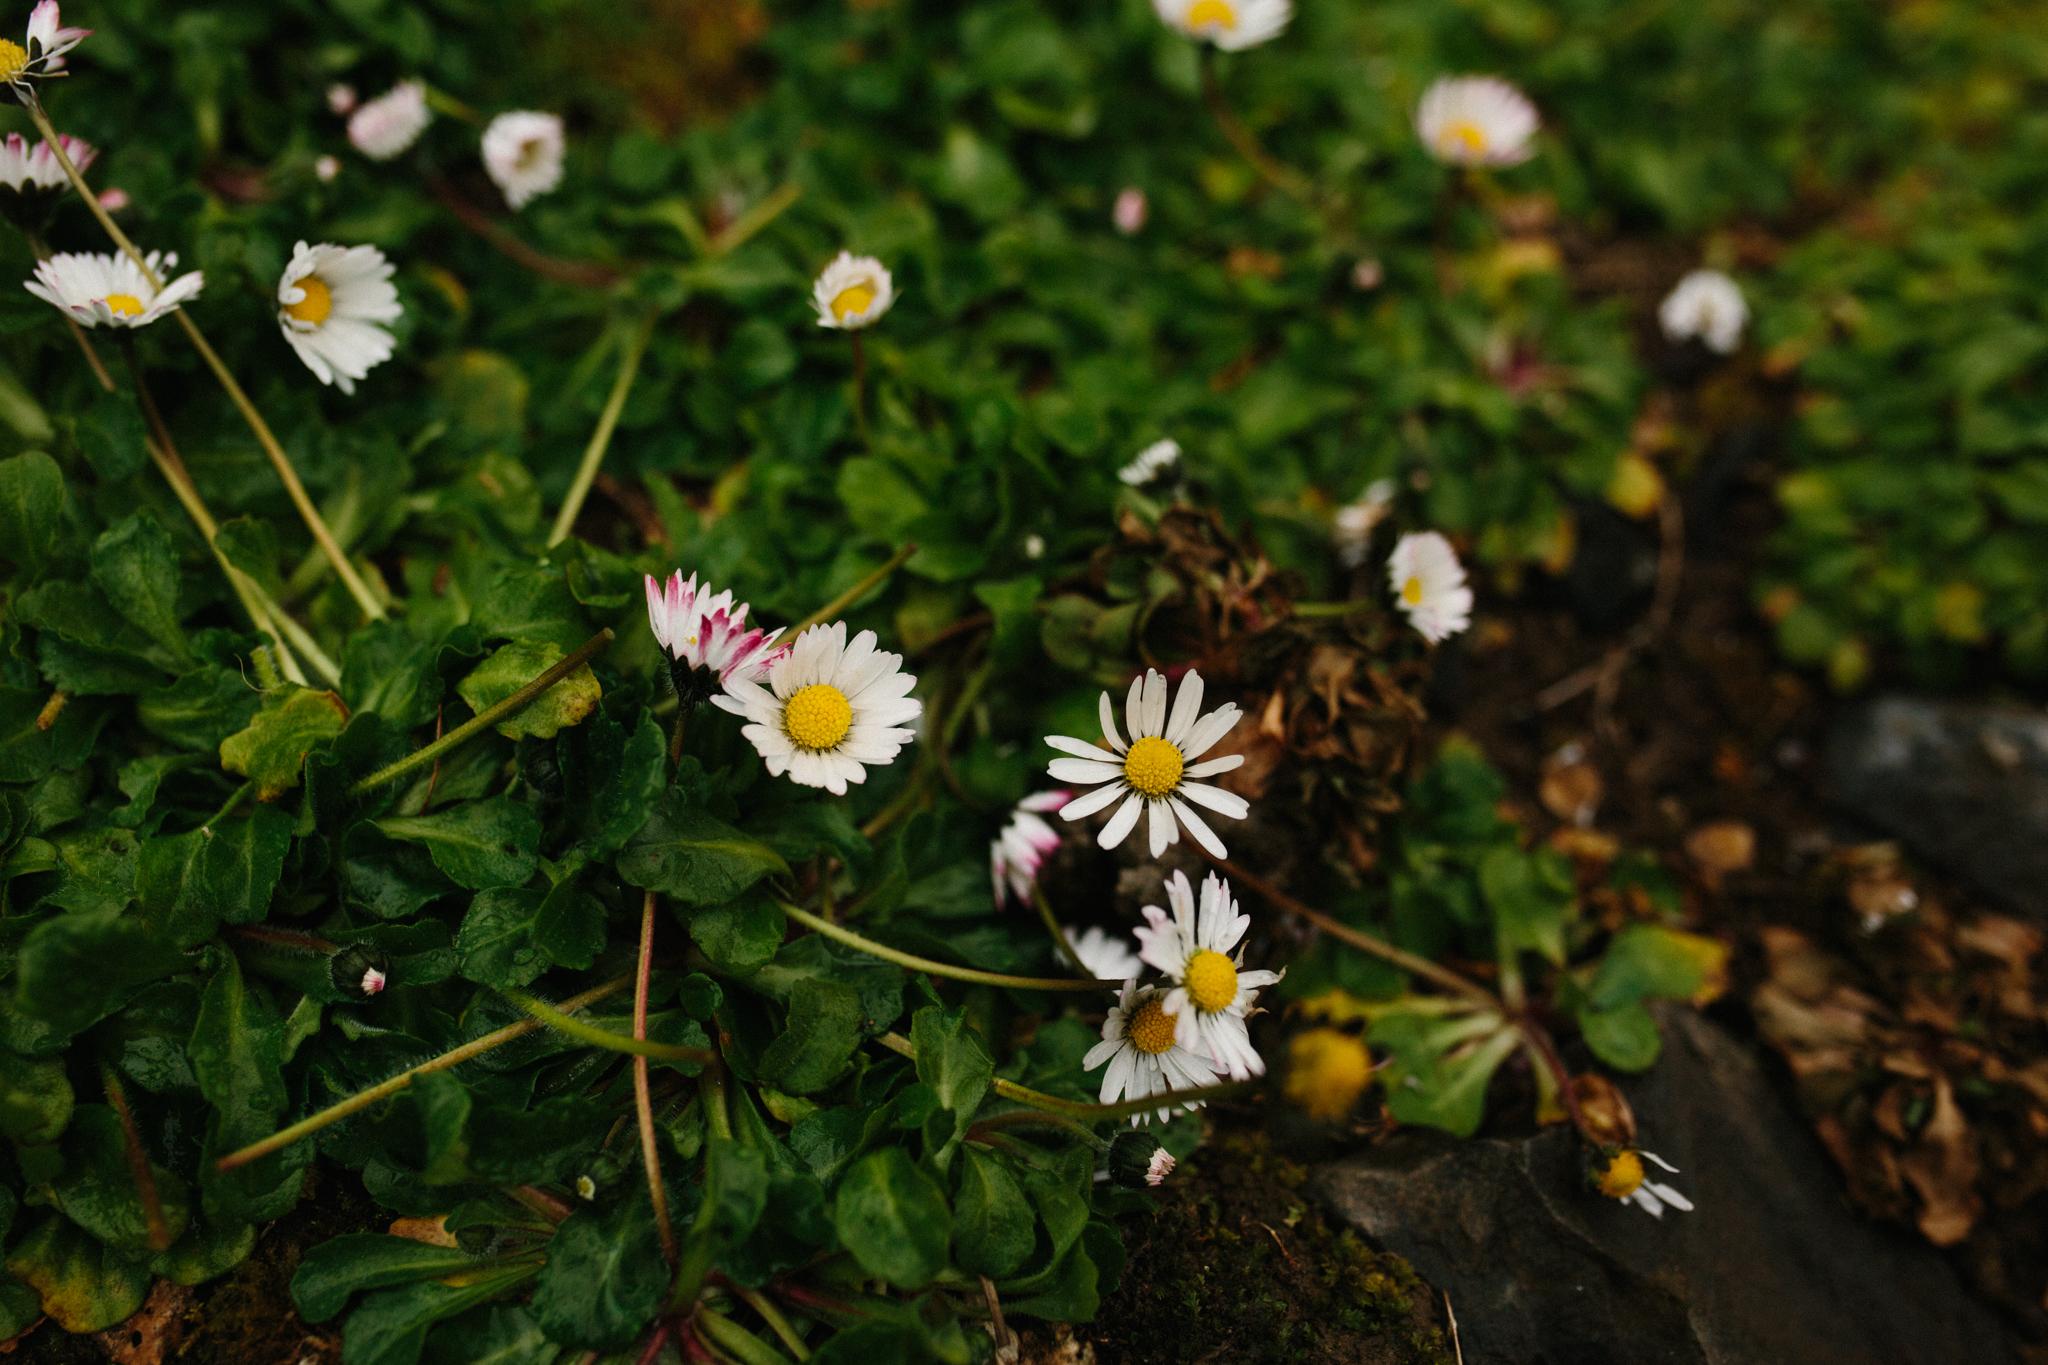 ireland_galway_dublin_rebecca_burt_photography-77.jpg